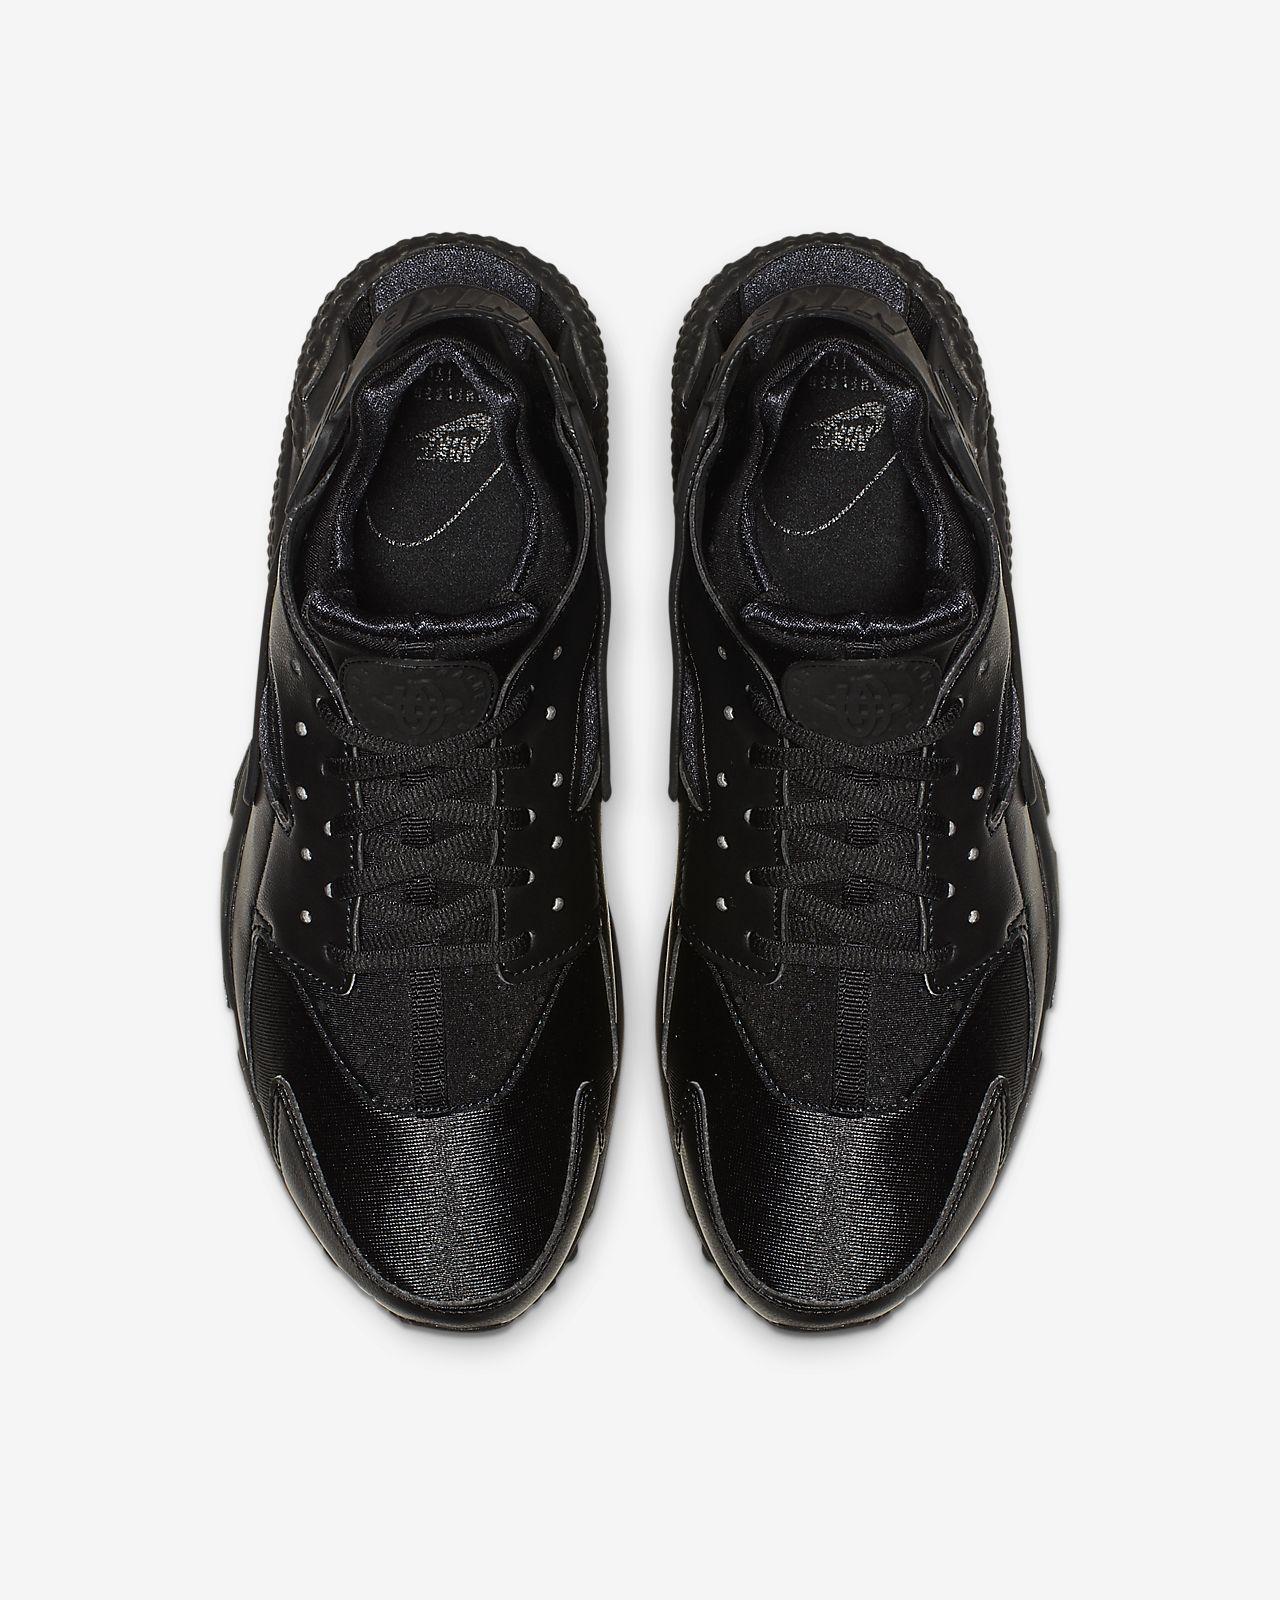 7bbd098ce9d49 Nike Air Huarache Women s Shoe. Nike.com EG